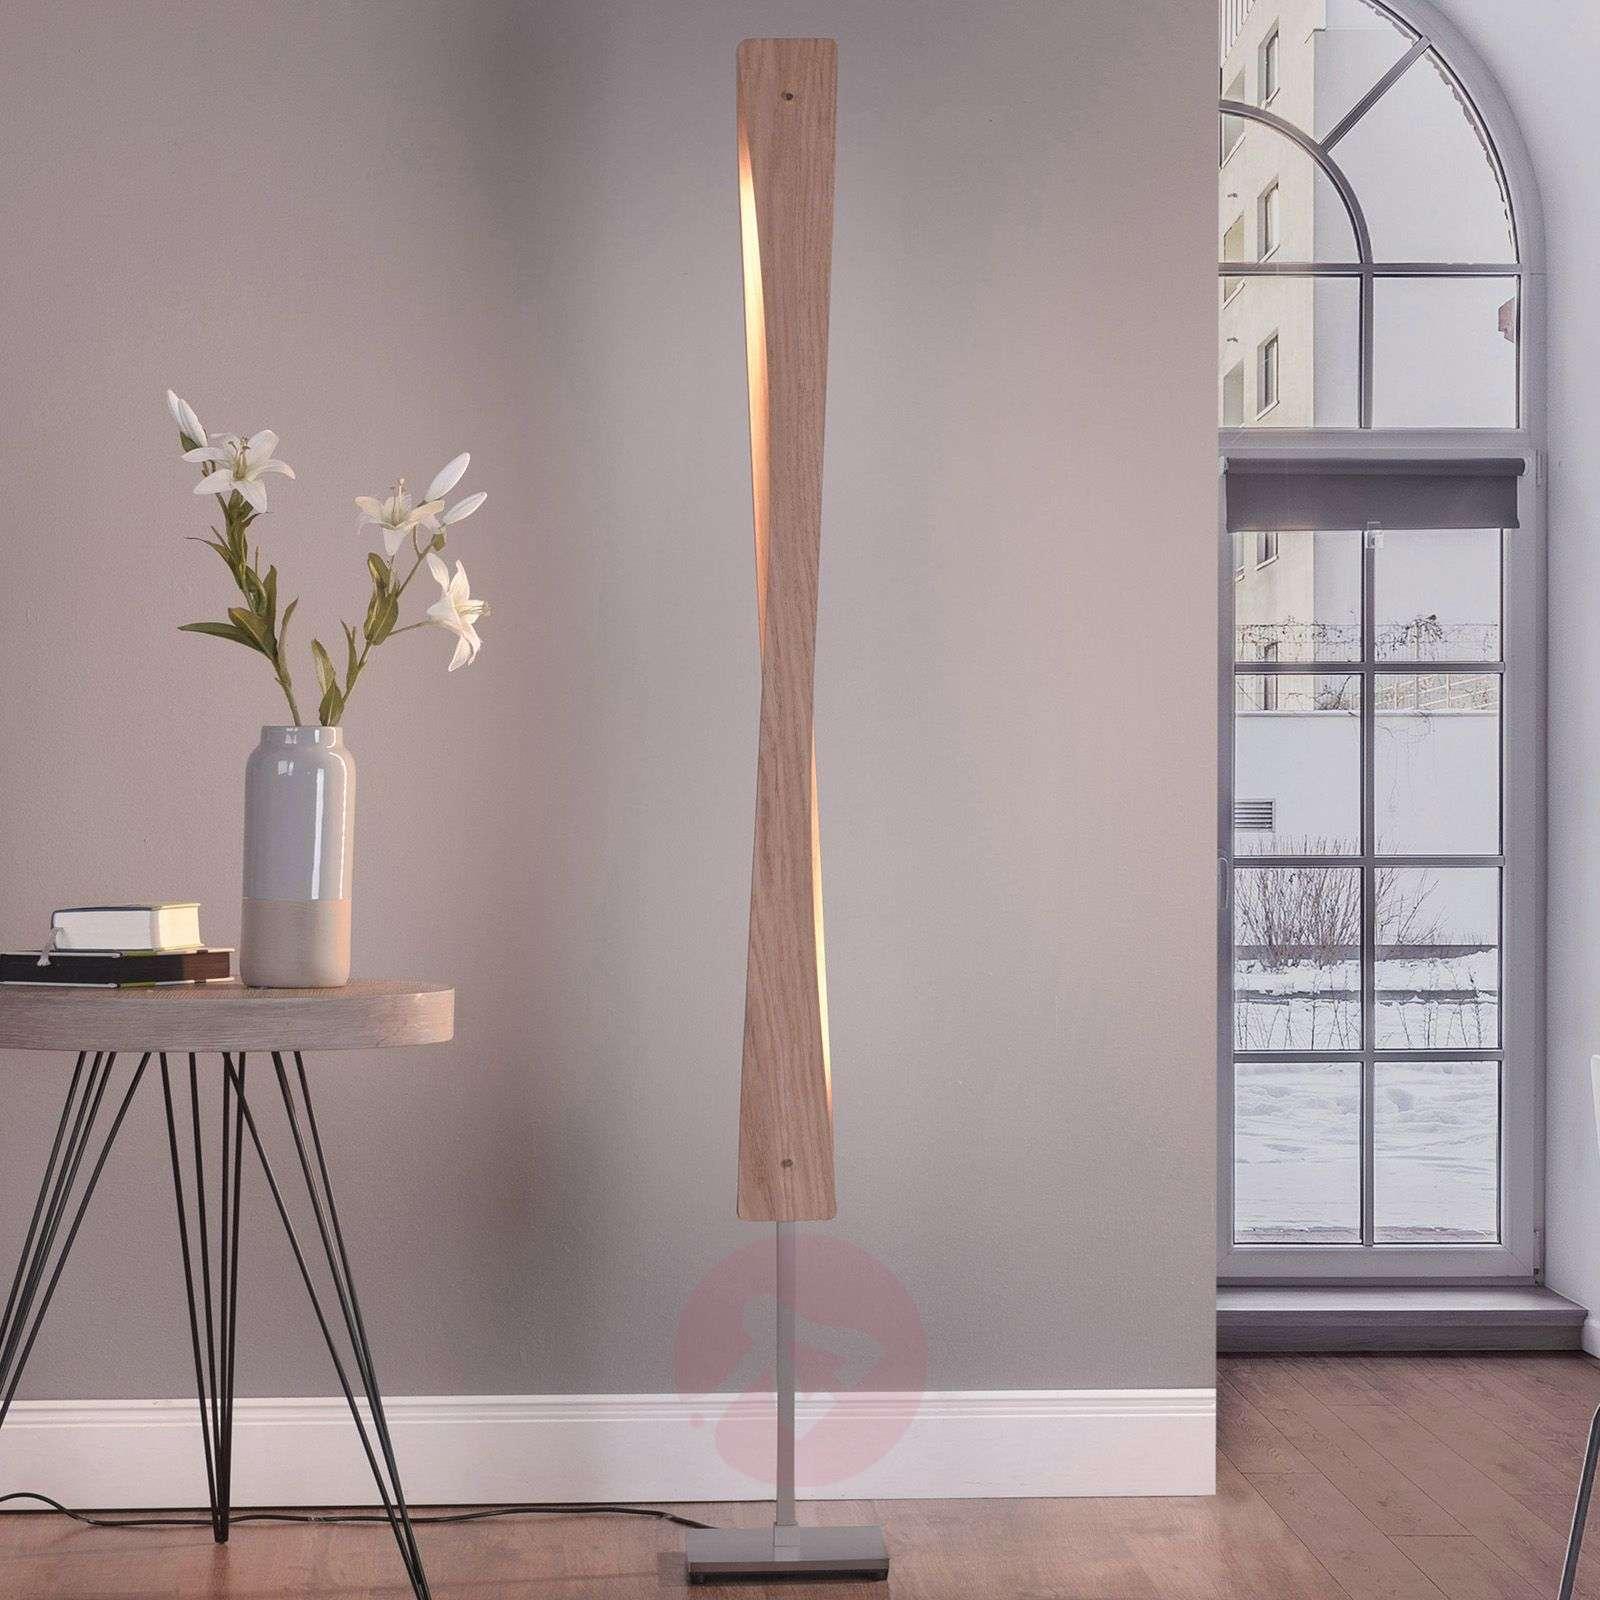 Lucande Lian LED-lattiavalaisin, tammi-6722561-01